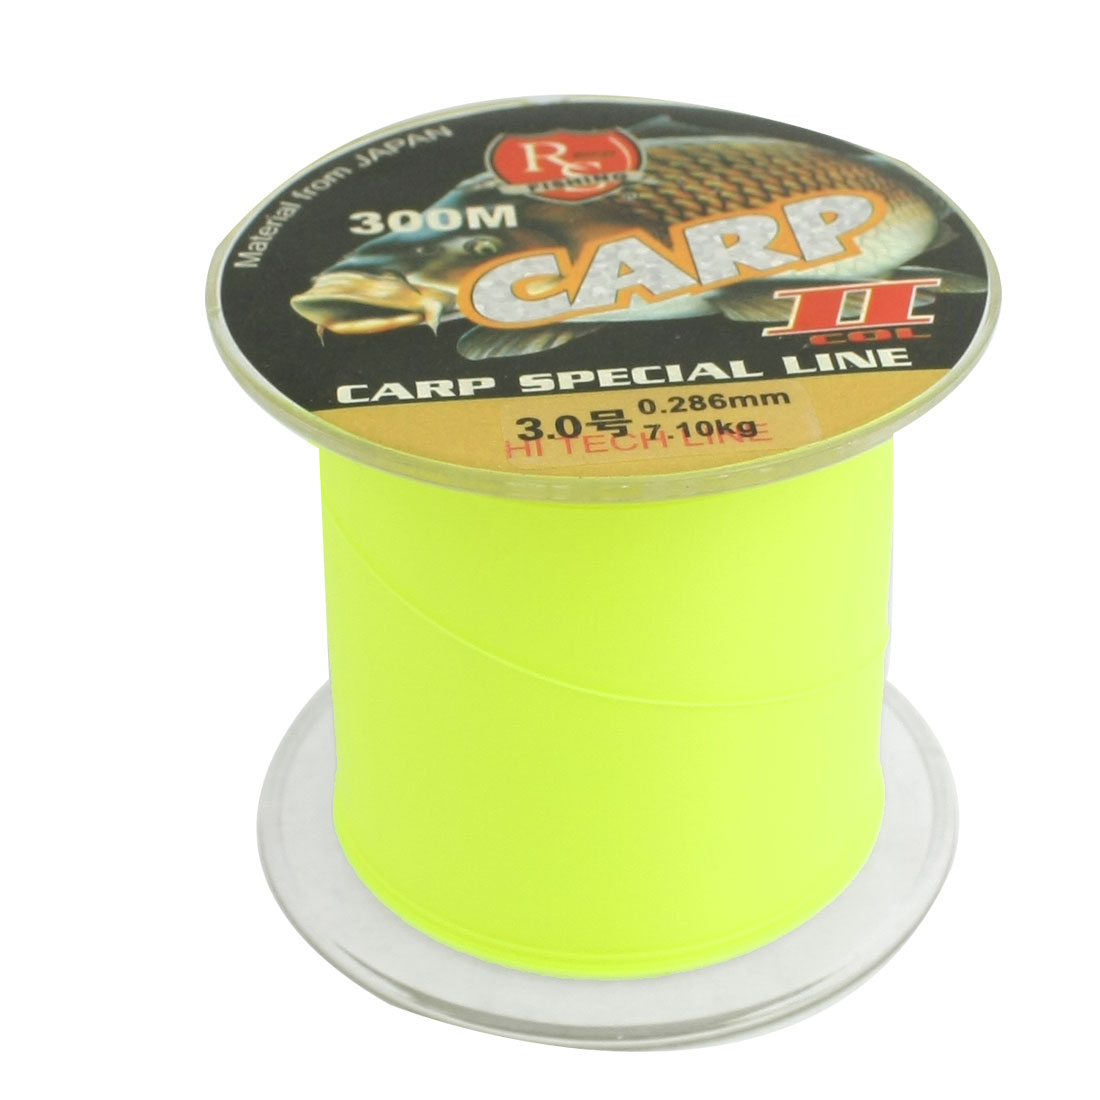 0.286mm Diameter 7.1Kg Yellow Green Nylon Freshwater Fishing Spool Line 300m